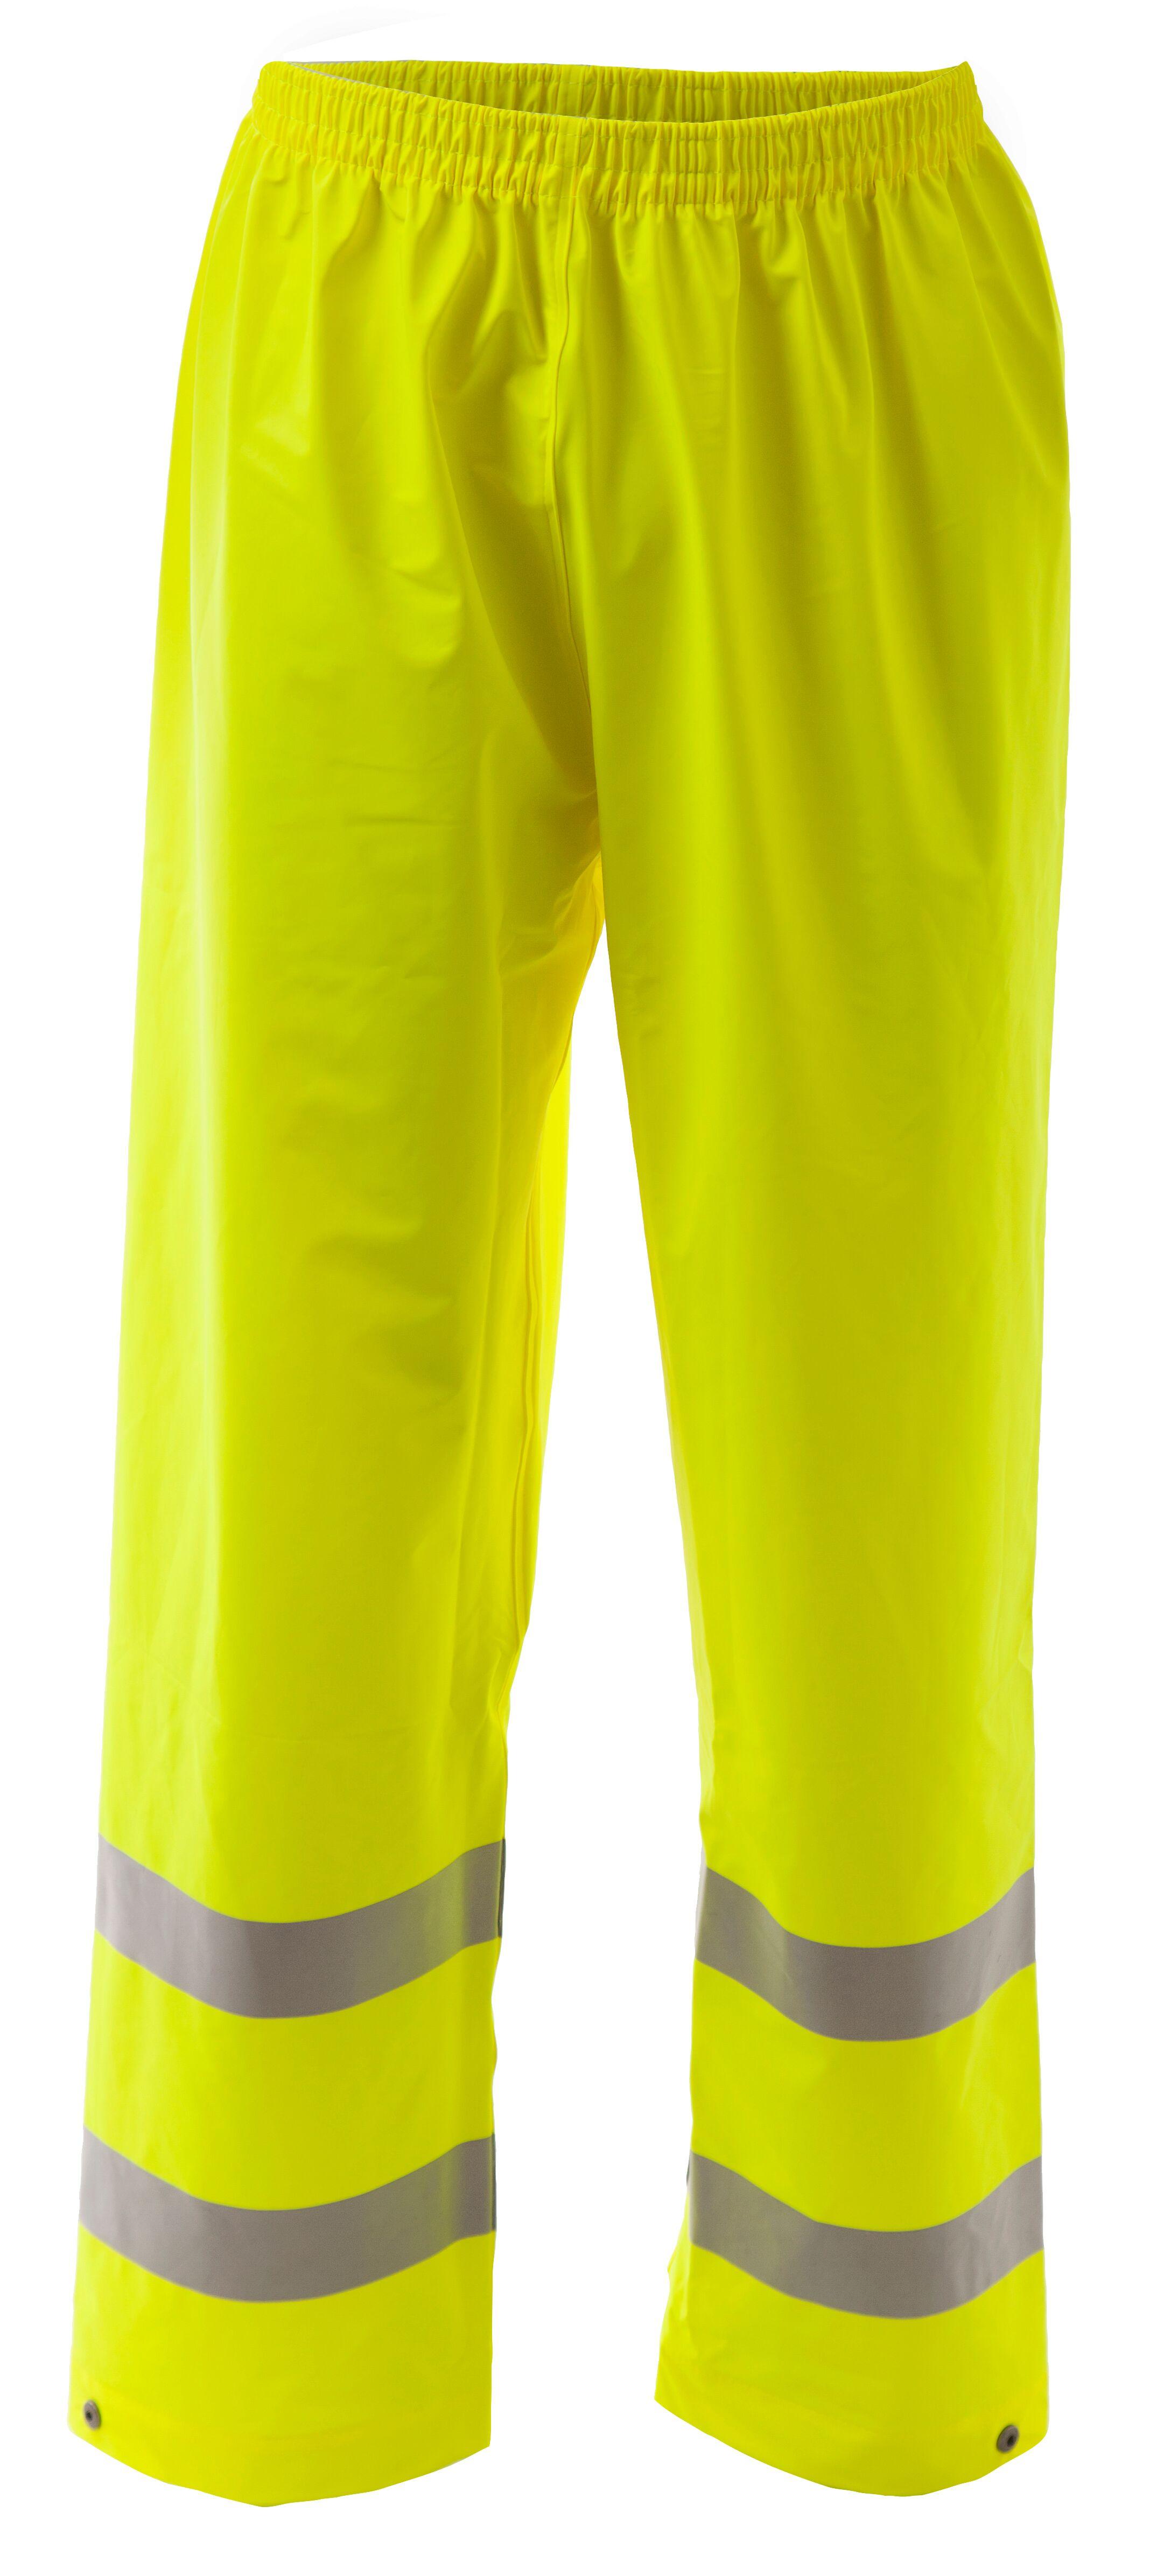 Portwest Sealtex Flame Resist Hi Vis Trouser Pant Safety Workwear Yellow FR43 XL for sale online